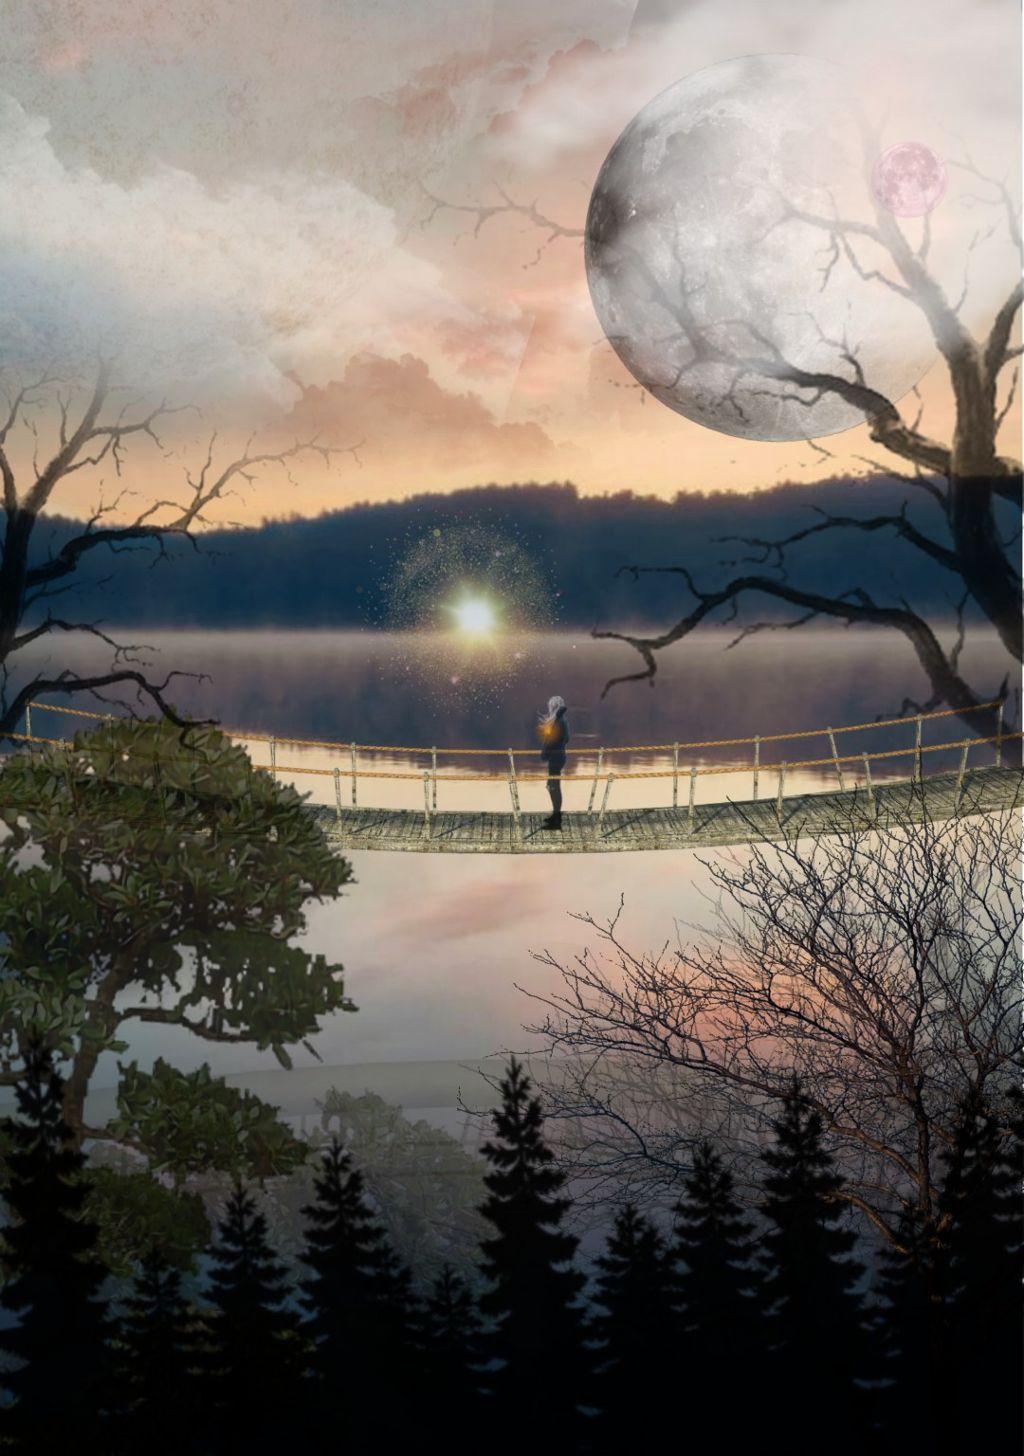 #freetoedit #girl #forest #magic #sun #moons #clouds #tree #water #bridge #sky